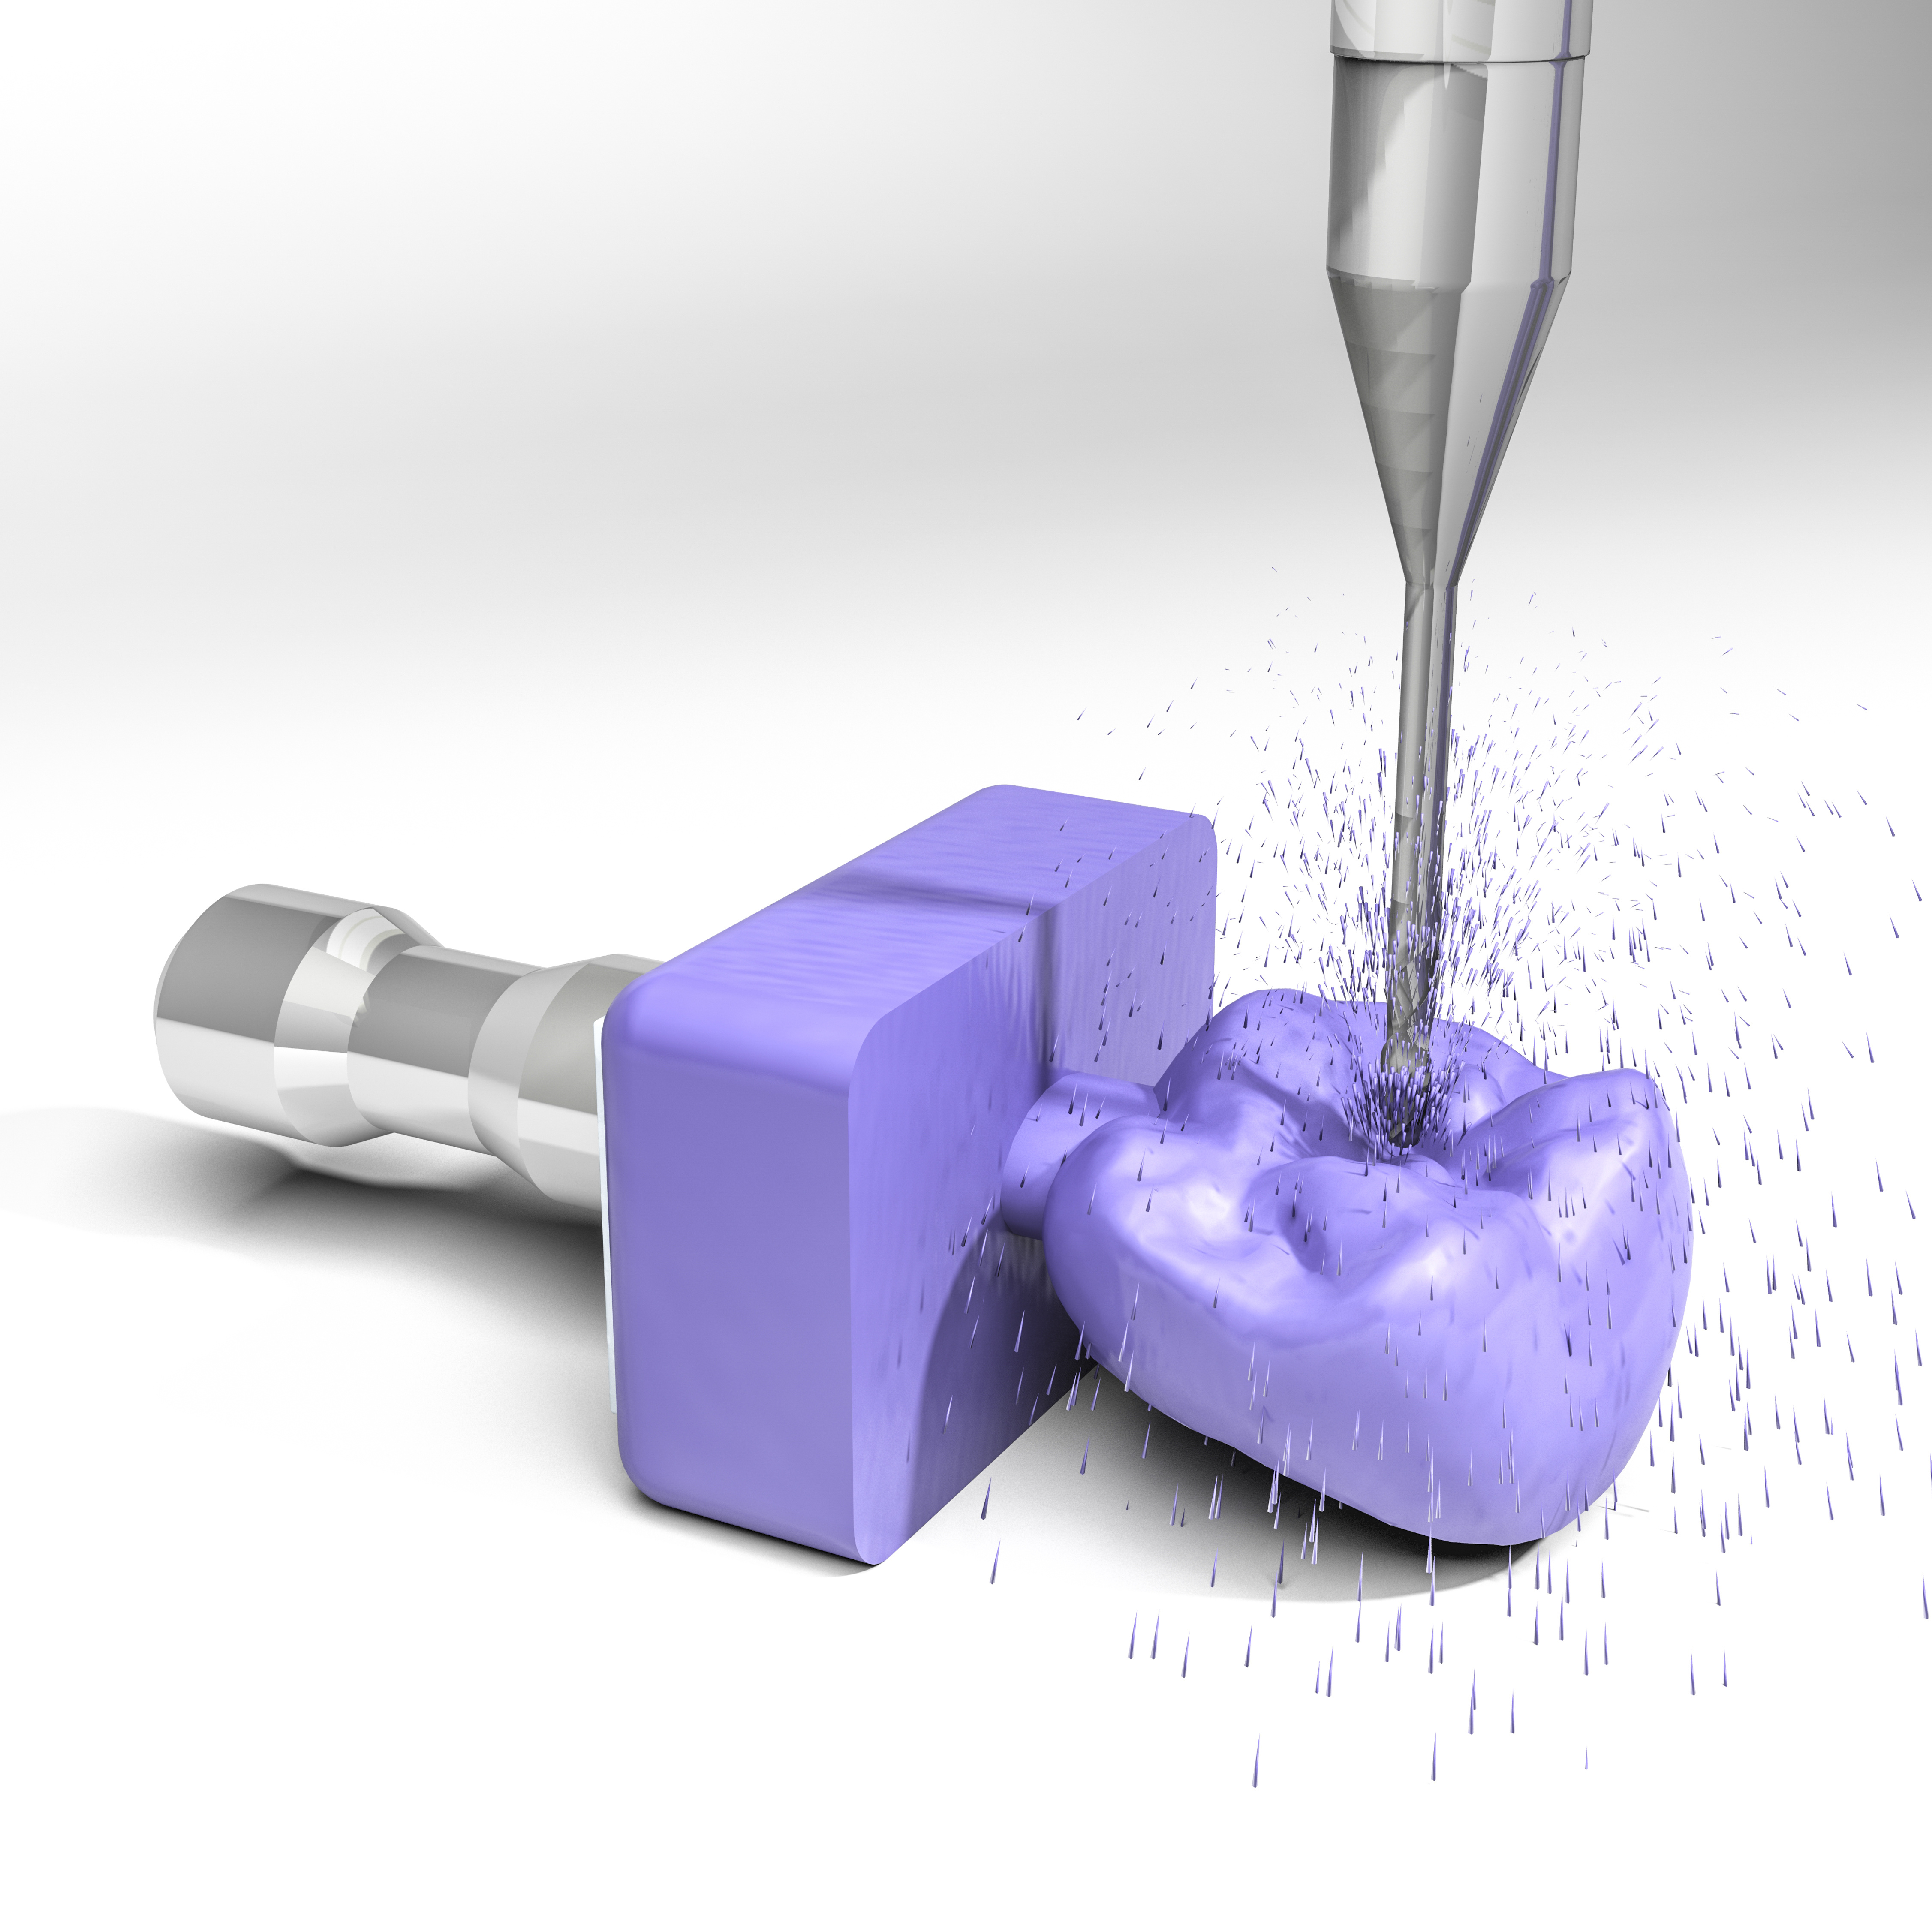 Prosthesis on implants at Clínica Dental Roca Santiago - Fuengirola